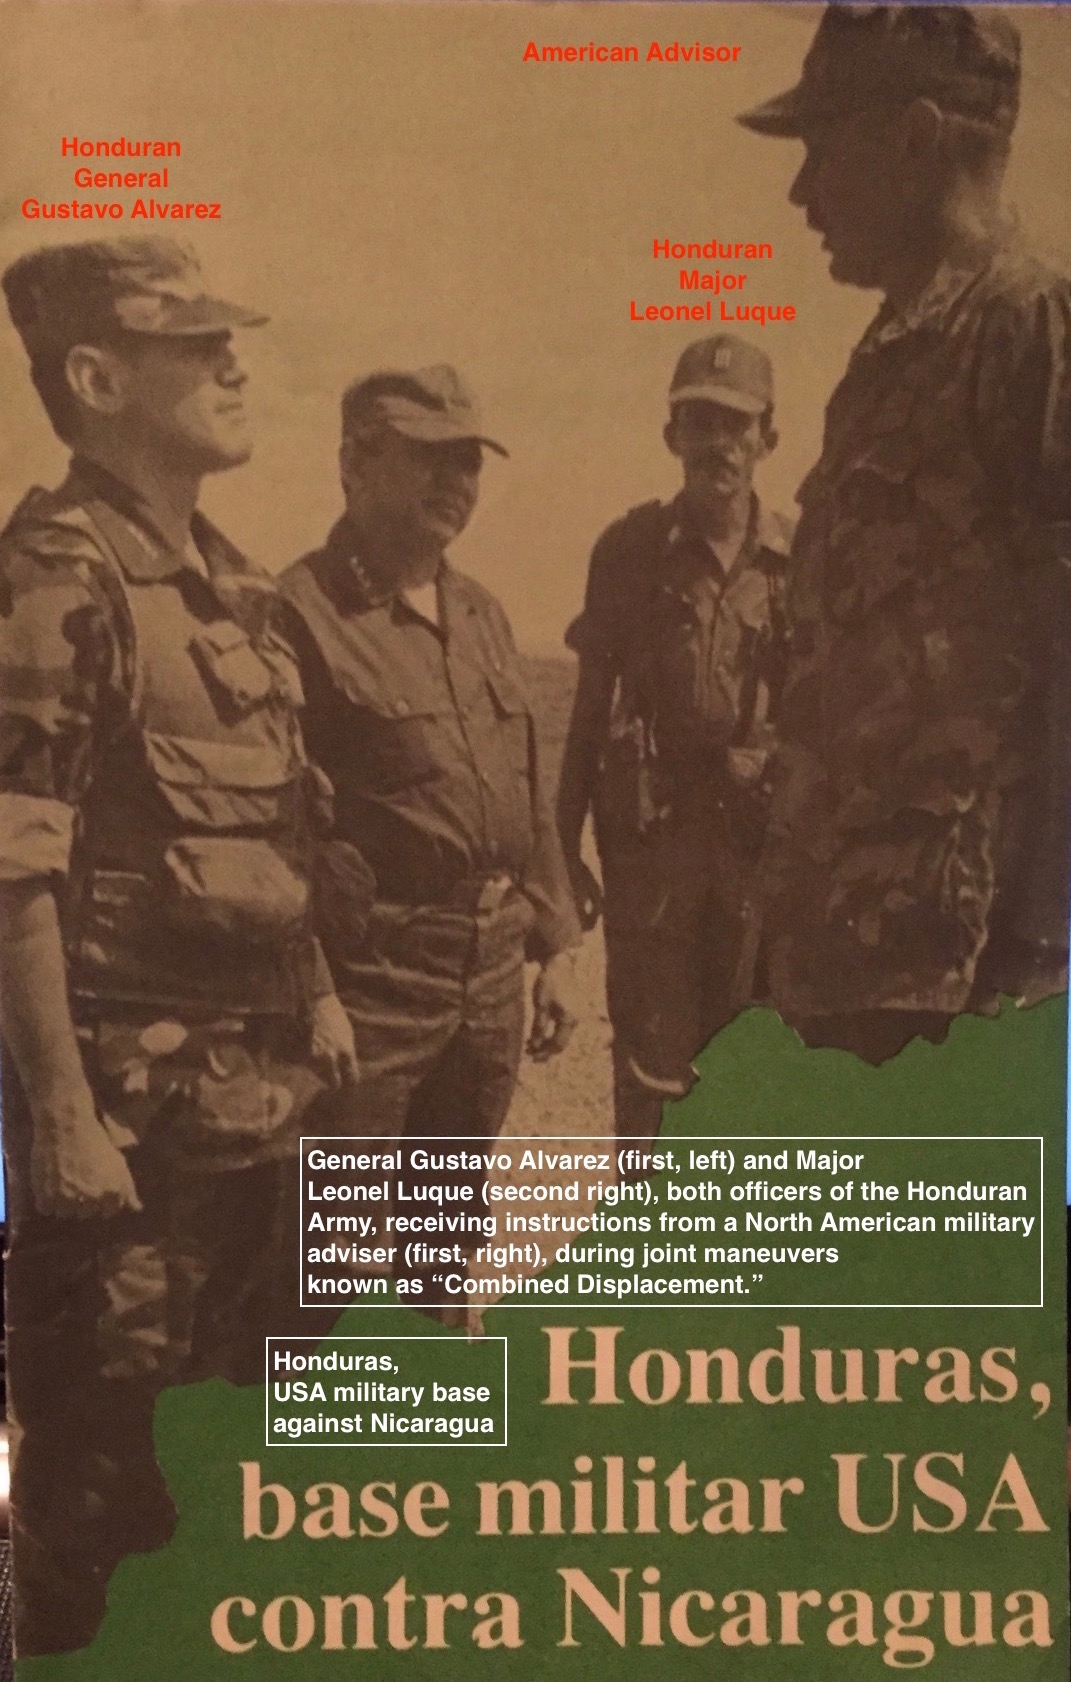 honduras-usa-military-base-against-nicaragua-1